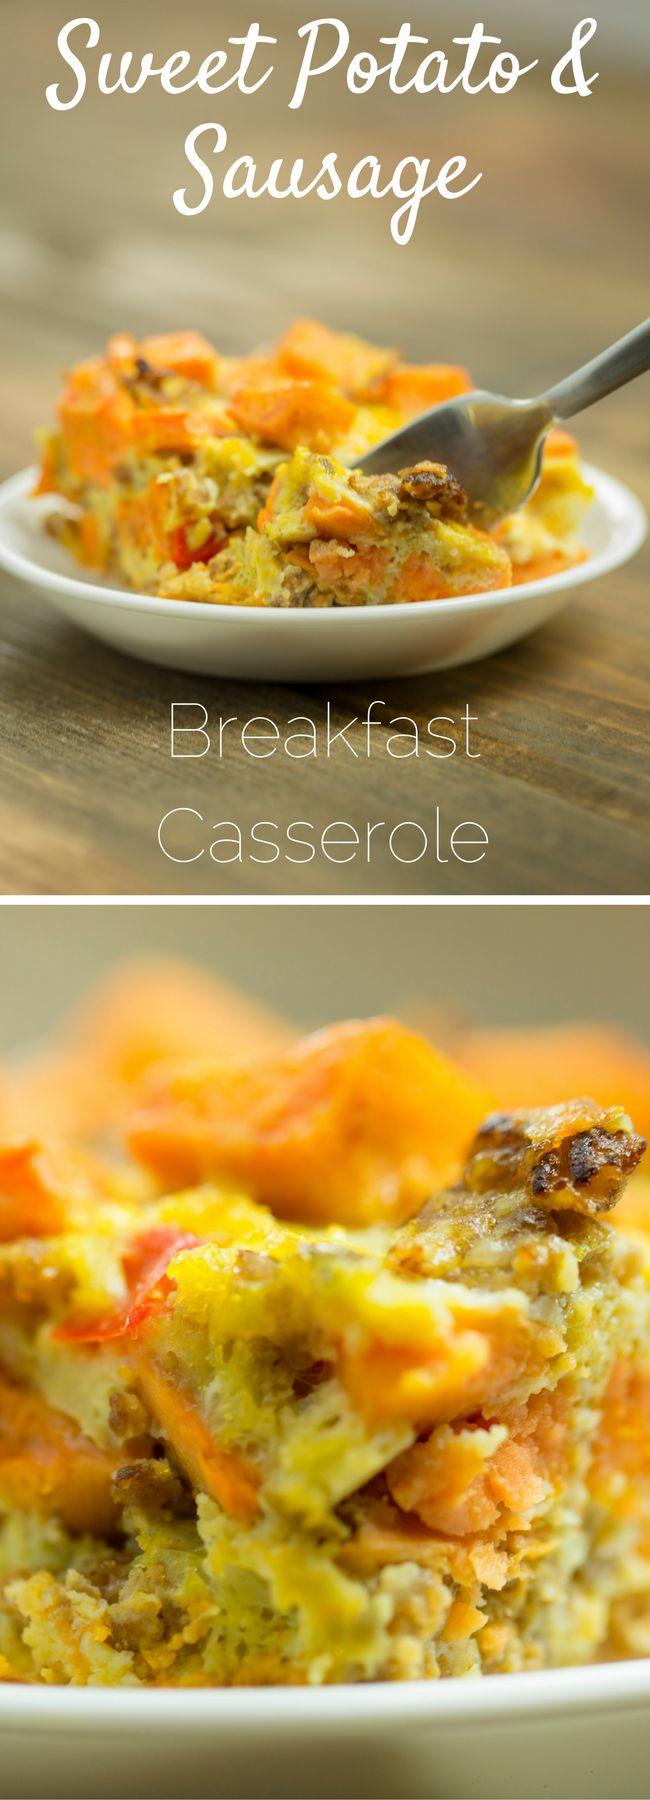 Healthy Breakfast Casserole w/ Sweet Potatoes, Italian Sausage and Peppers